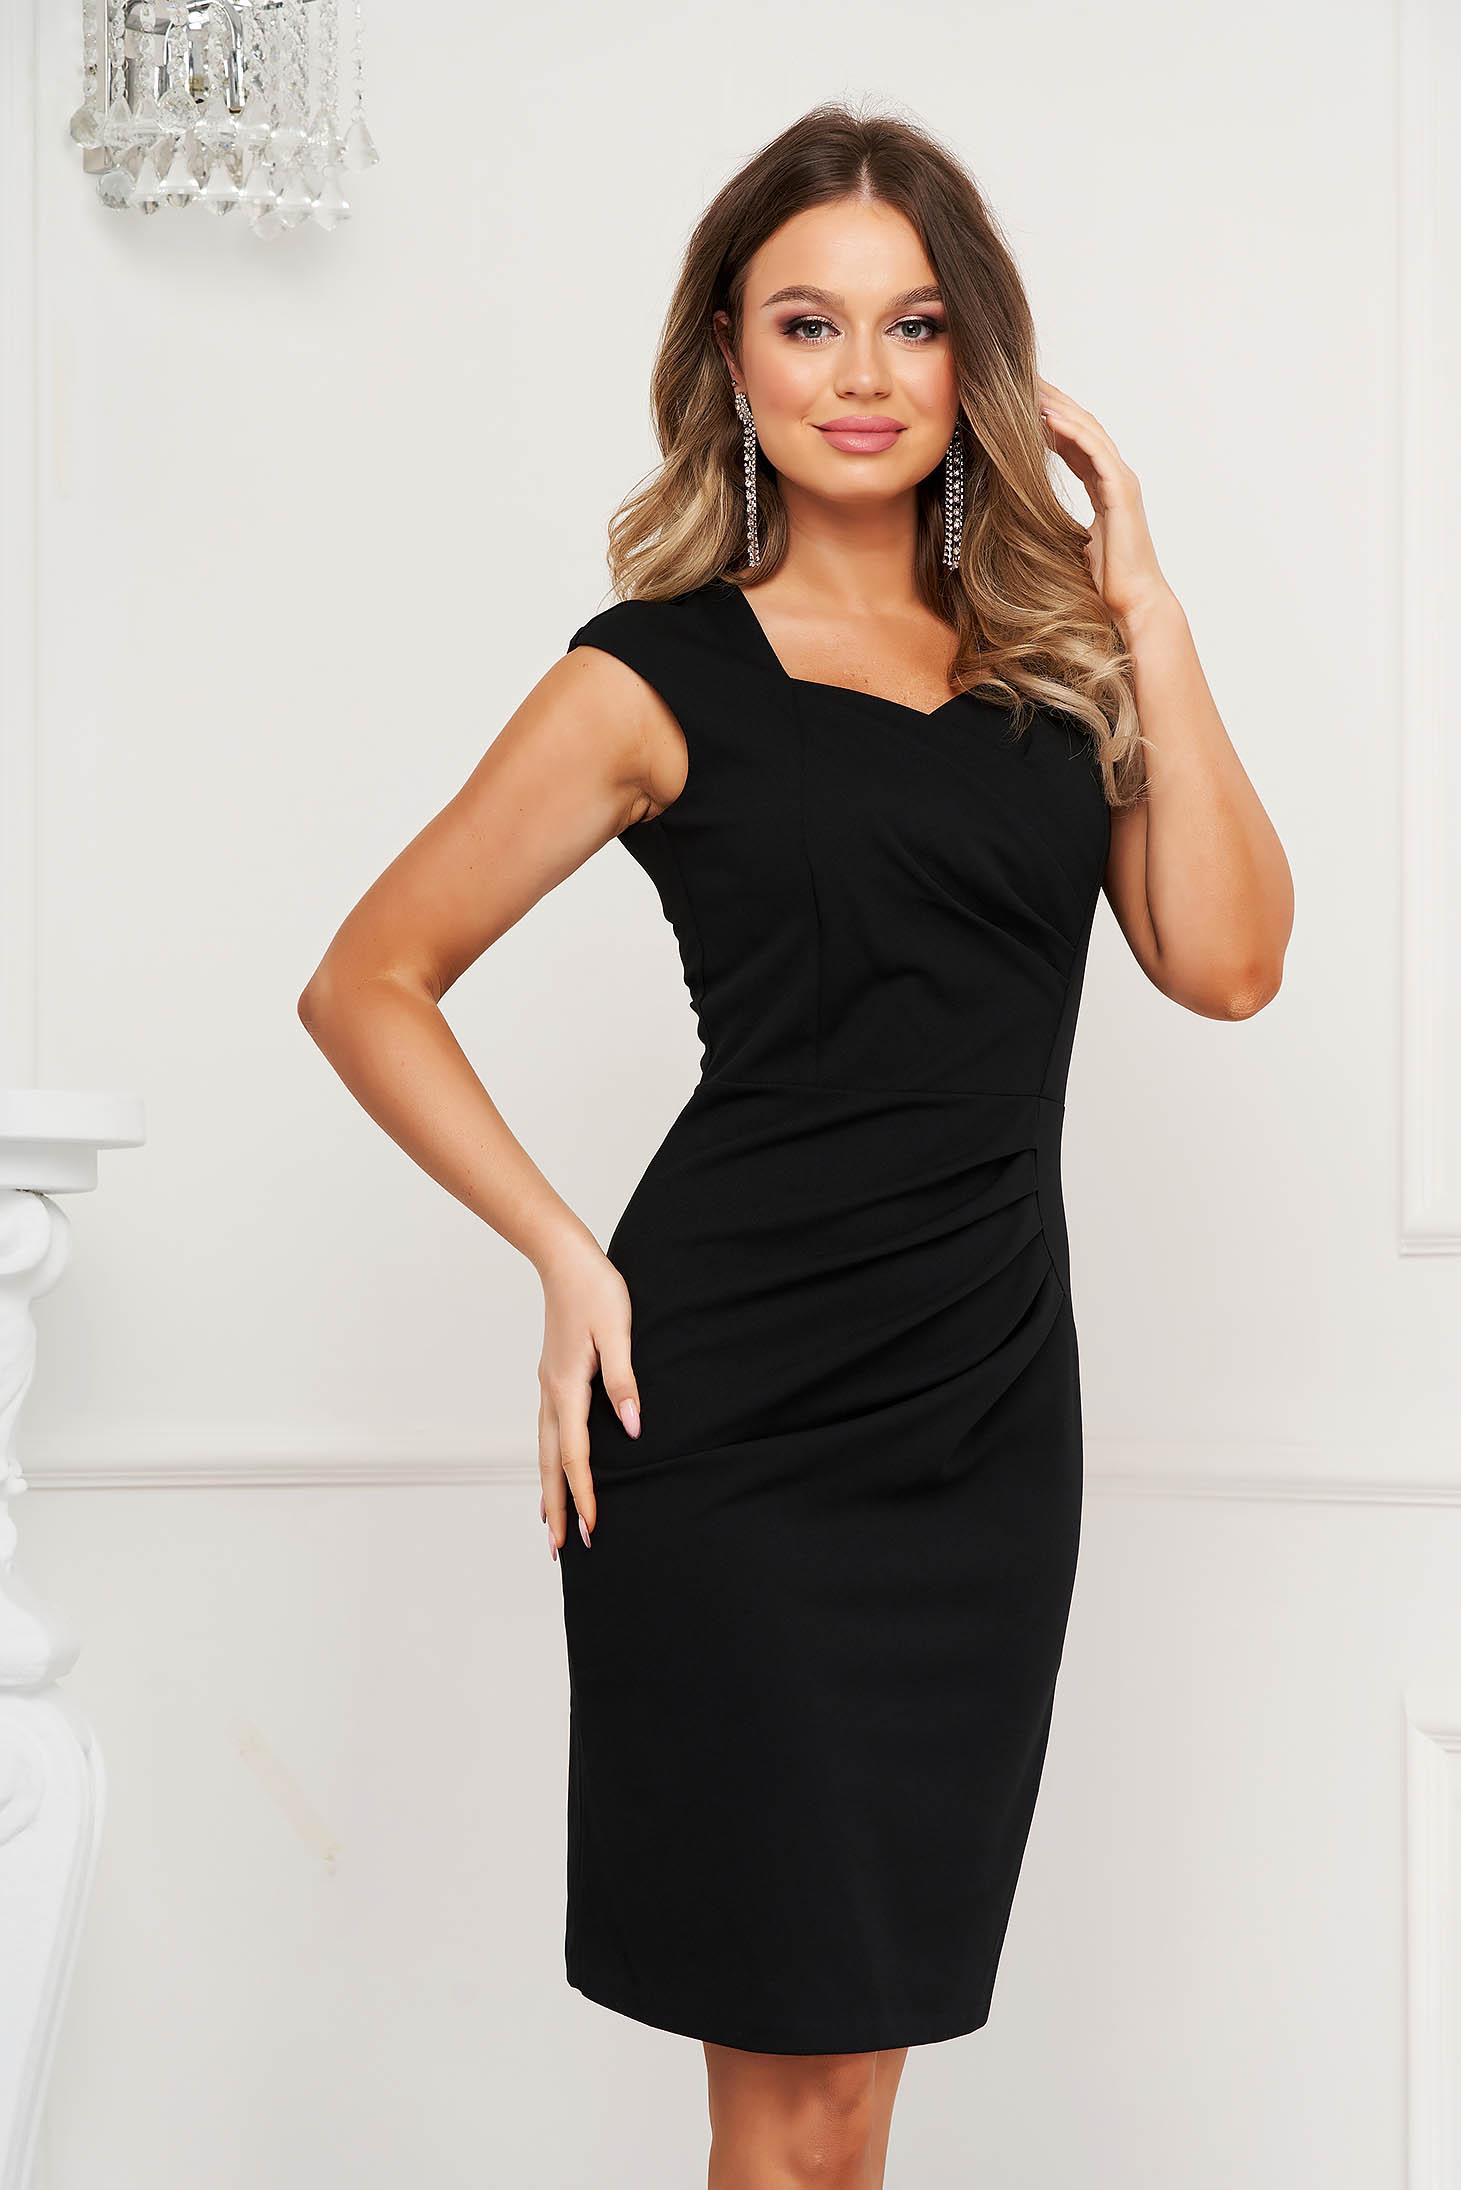 Black dress pencil occasional short cut slightly wrinkled fabric